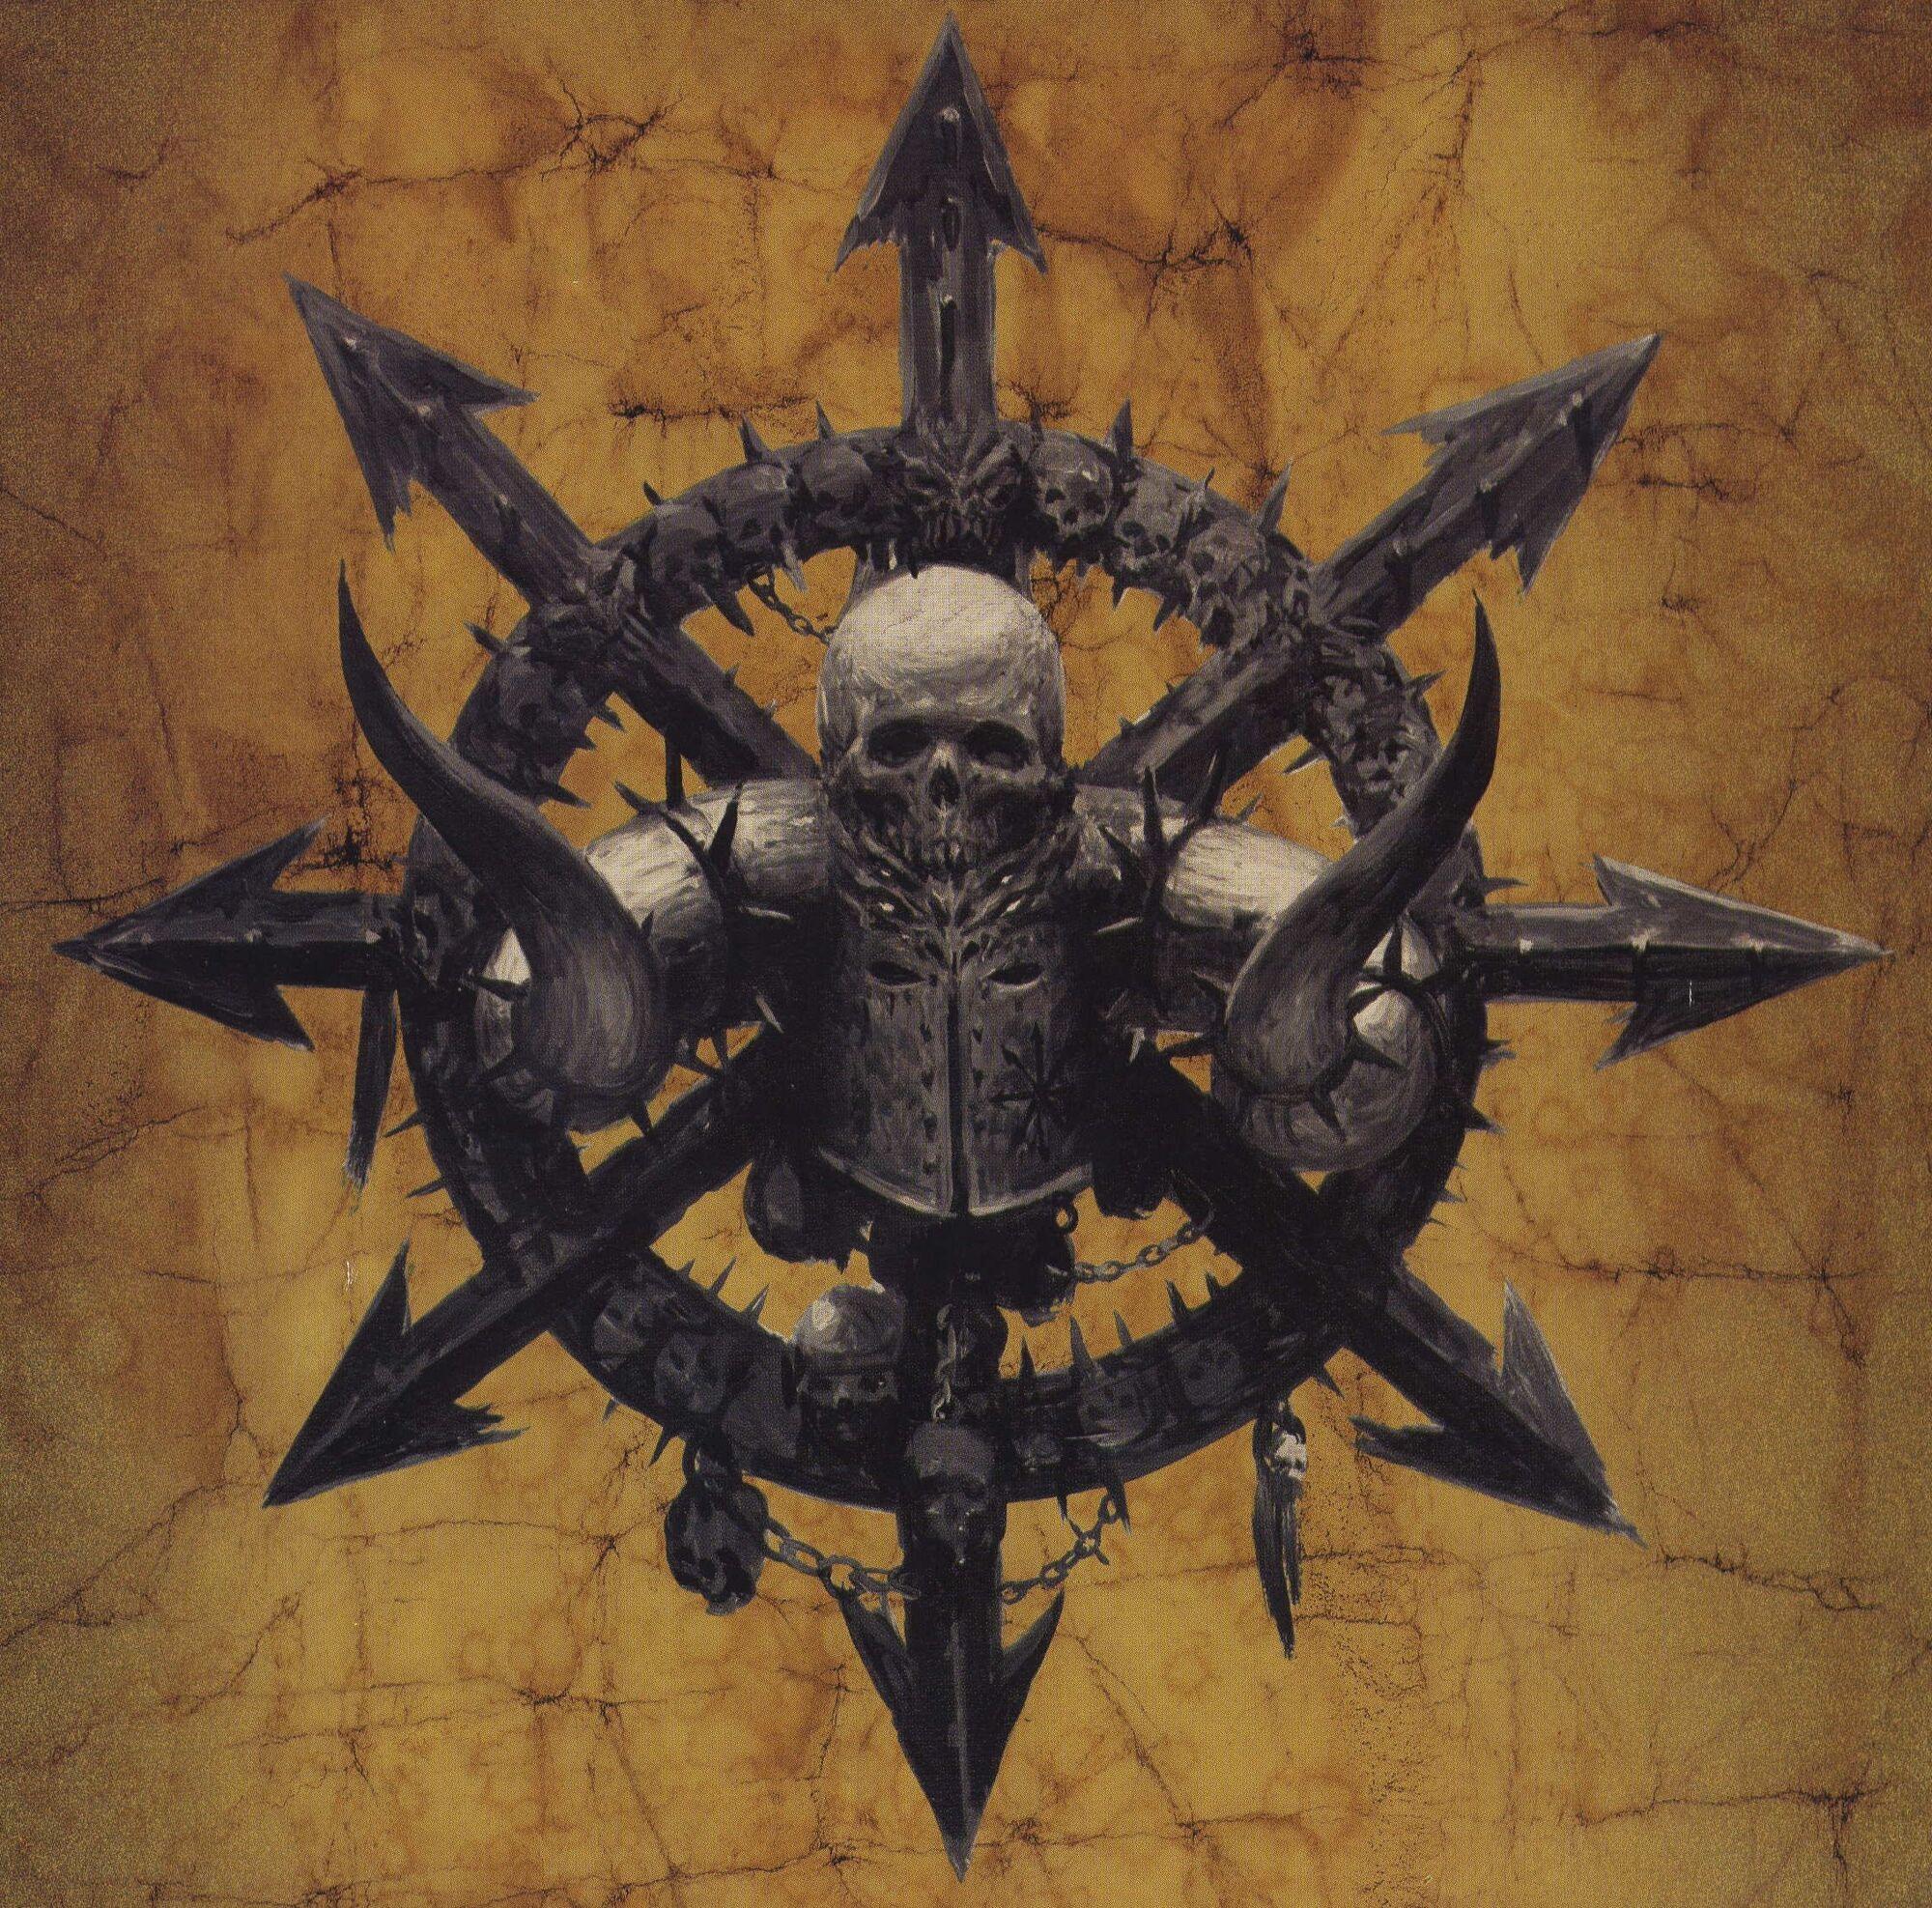 Image - Chaos Warrior Emblem.jpg | Warhammer Wiki | FANDOM ...